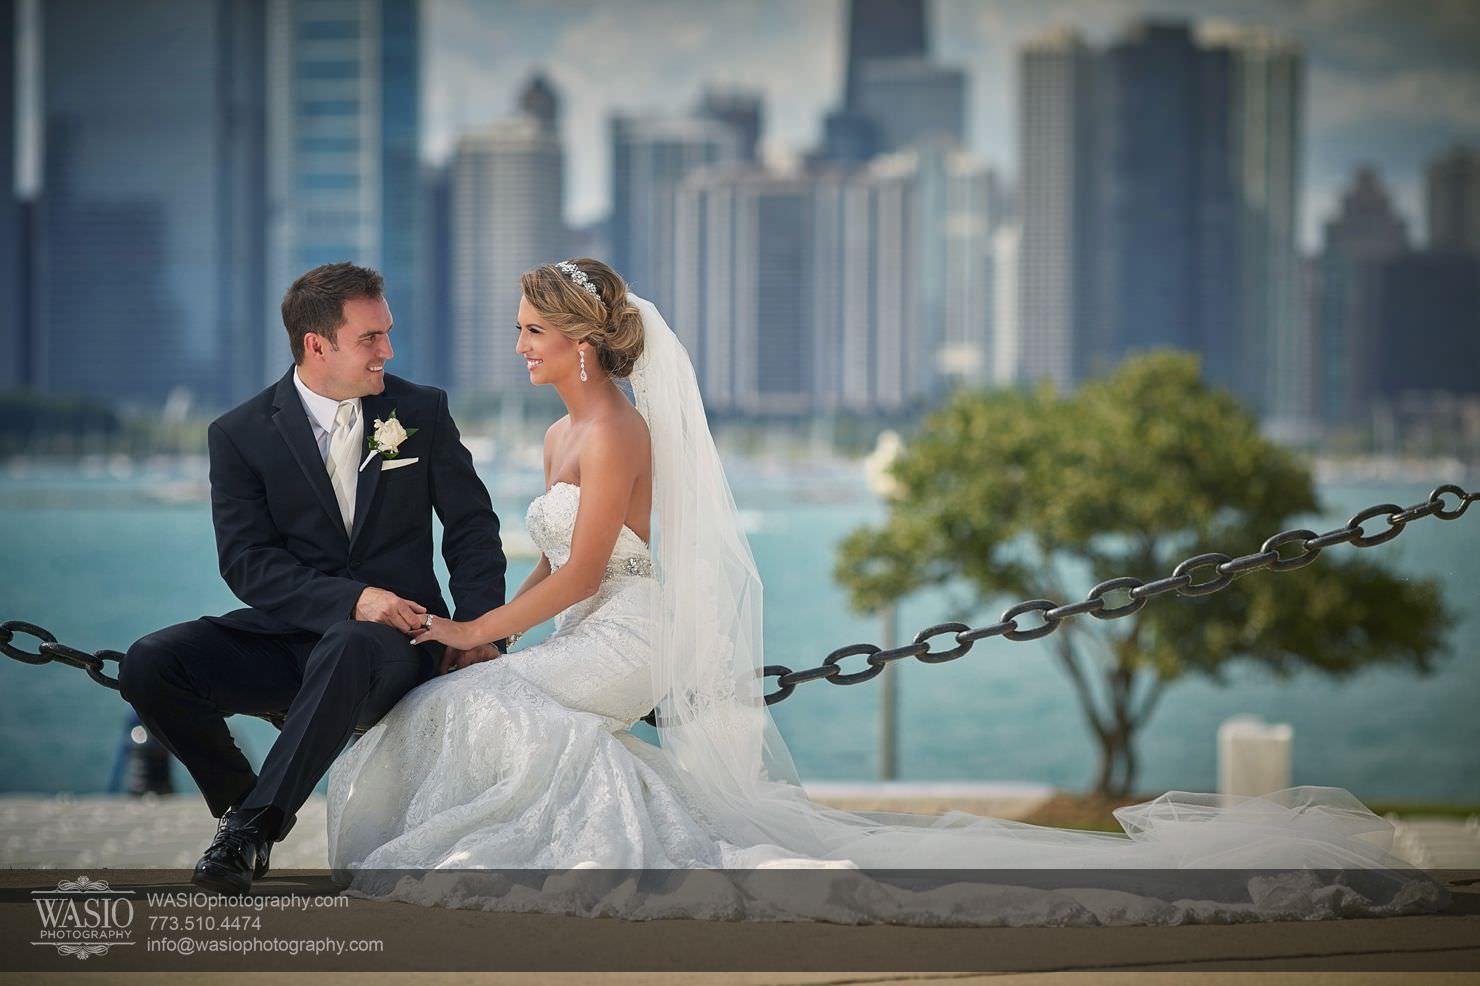 16_Chicago-Summer-Wedding_Angelica-and-Pawel-wedding-1682 Chicago Summer Wedding - Angelica & Pawel